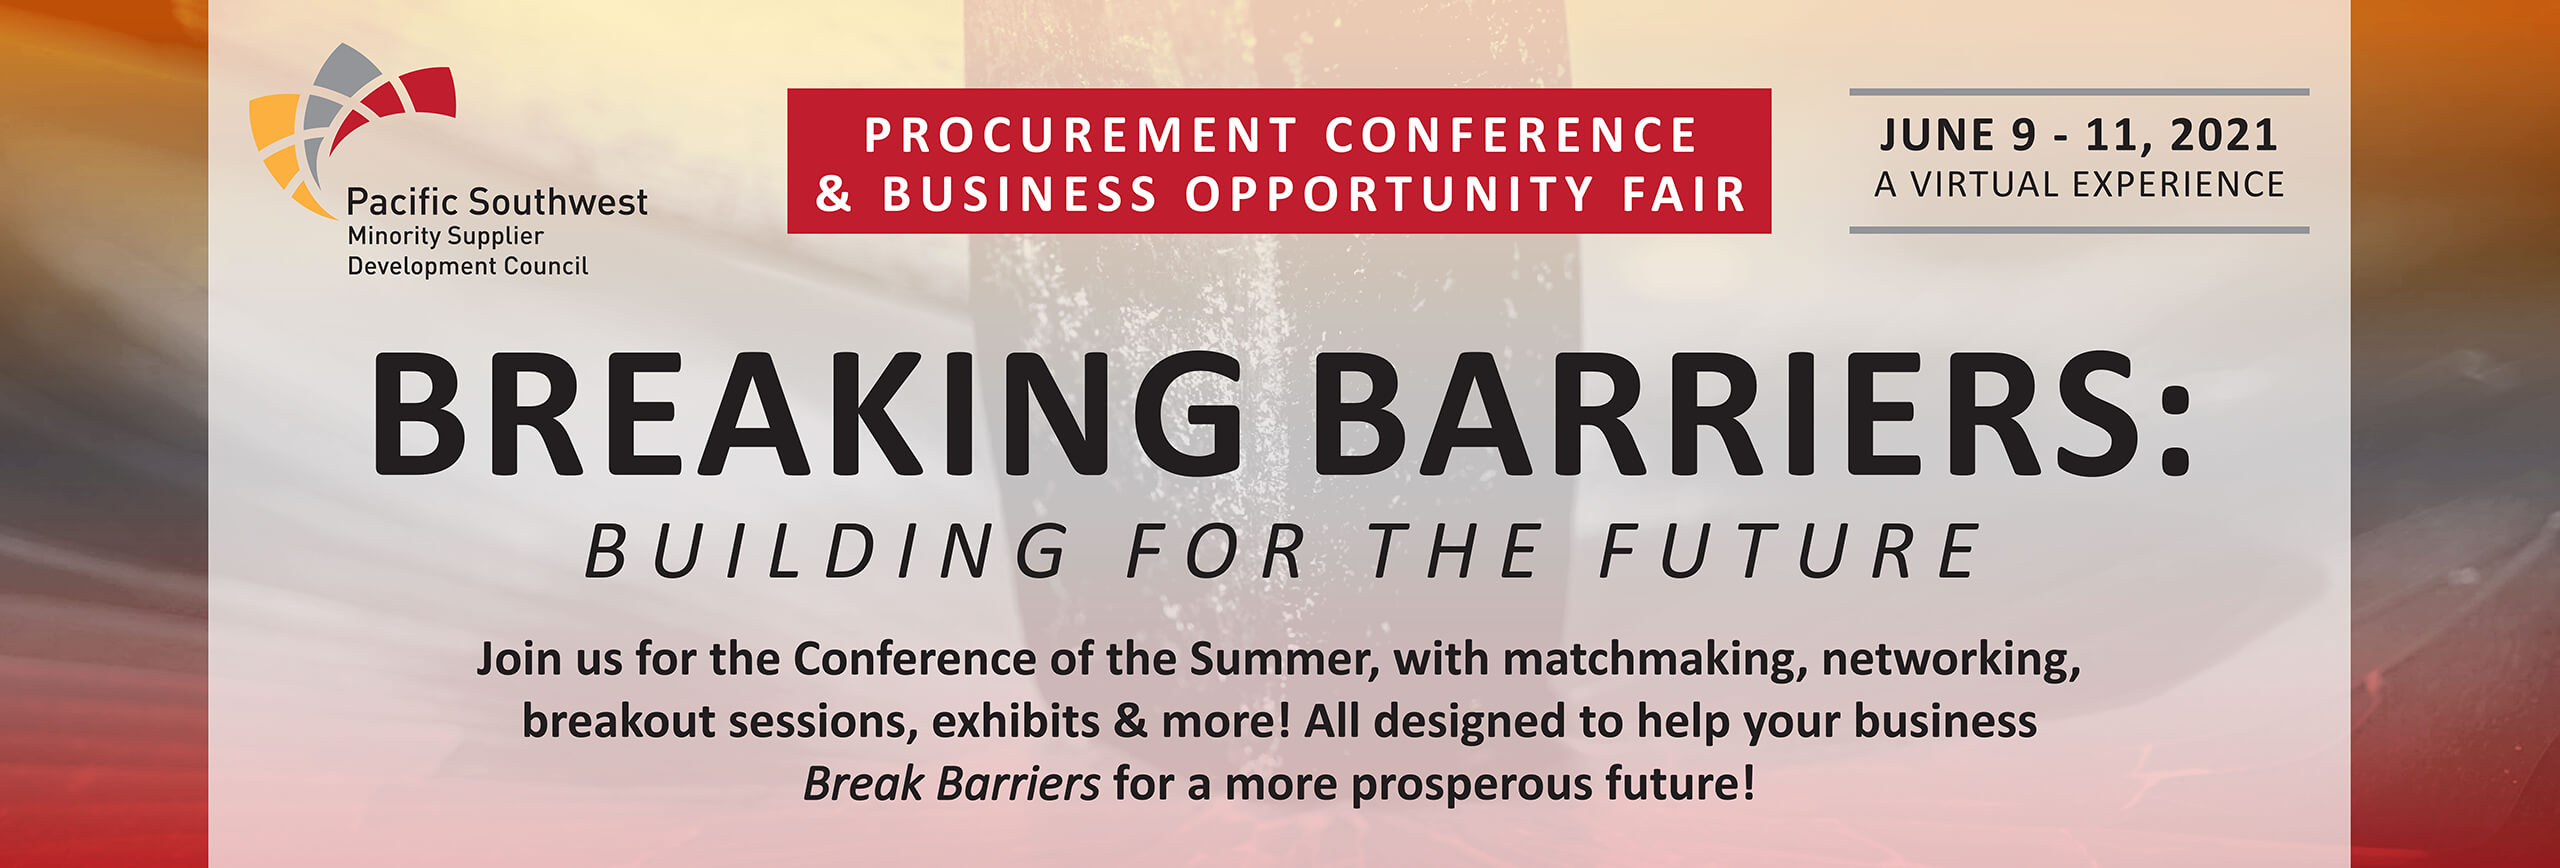 2021 Virtual Procurement Conference & Supplier Diversity Excellence Awards Ceremony Banner